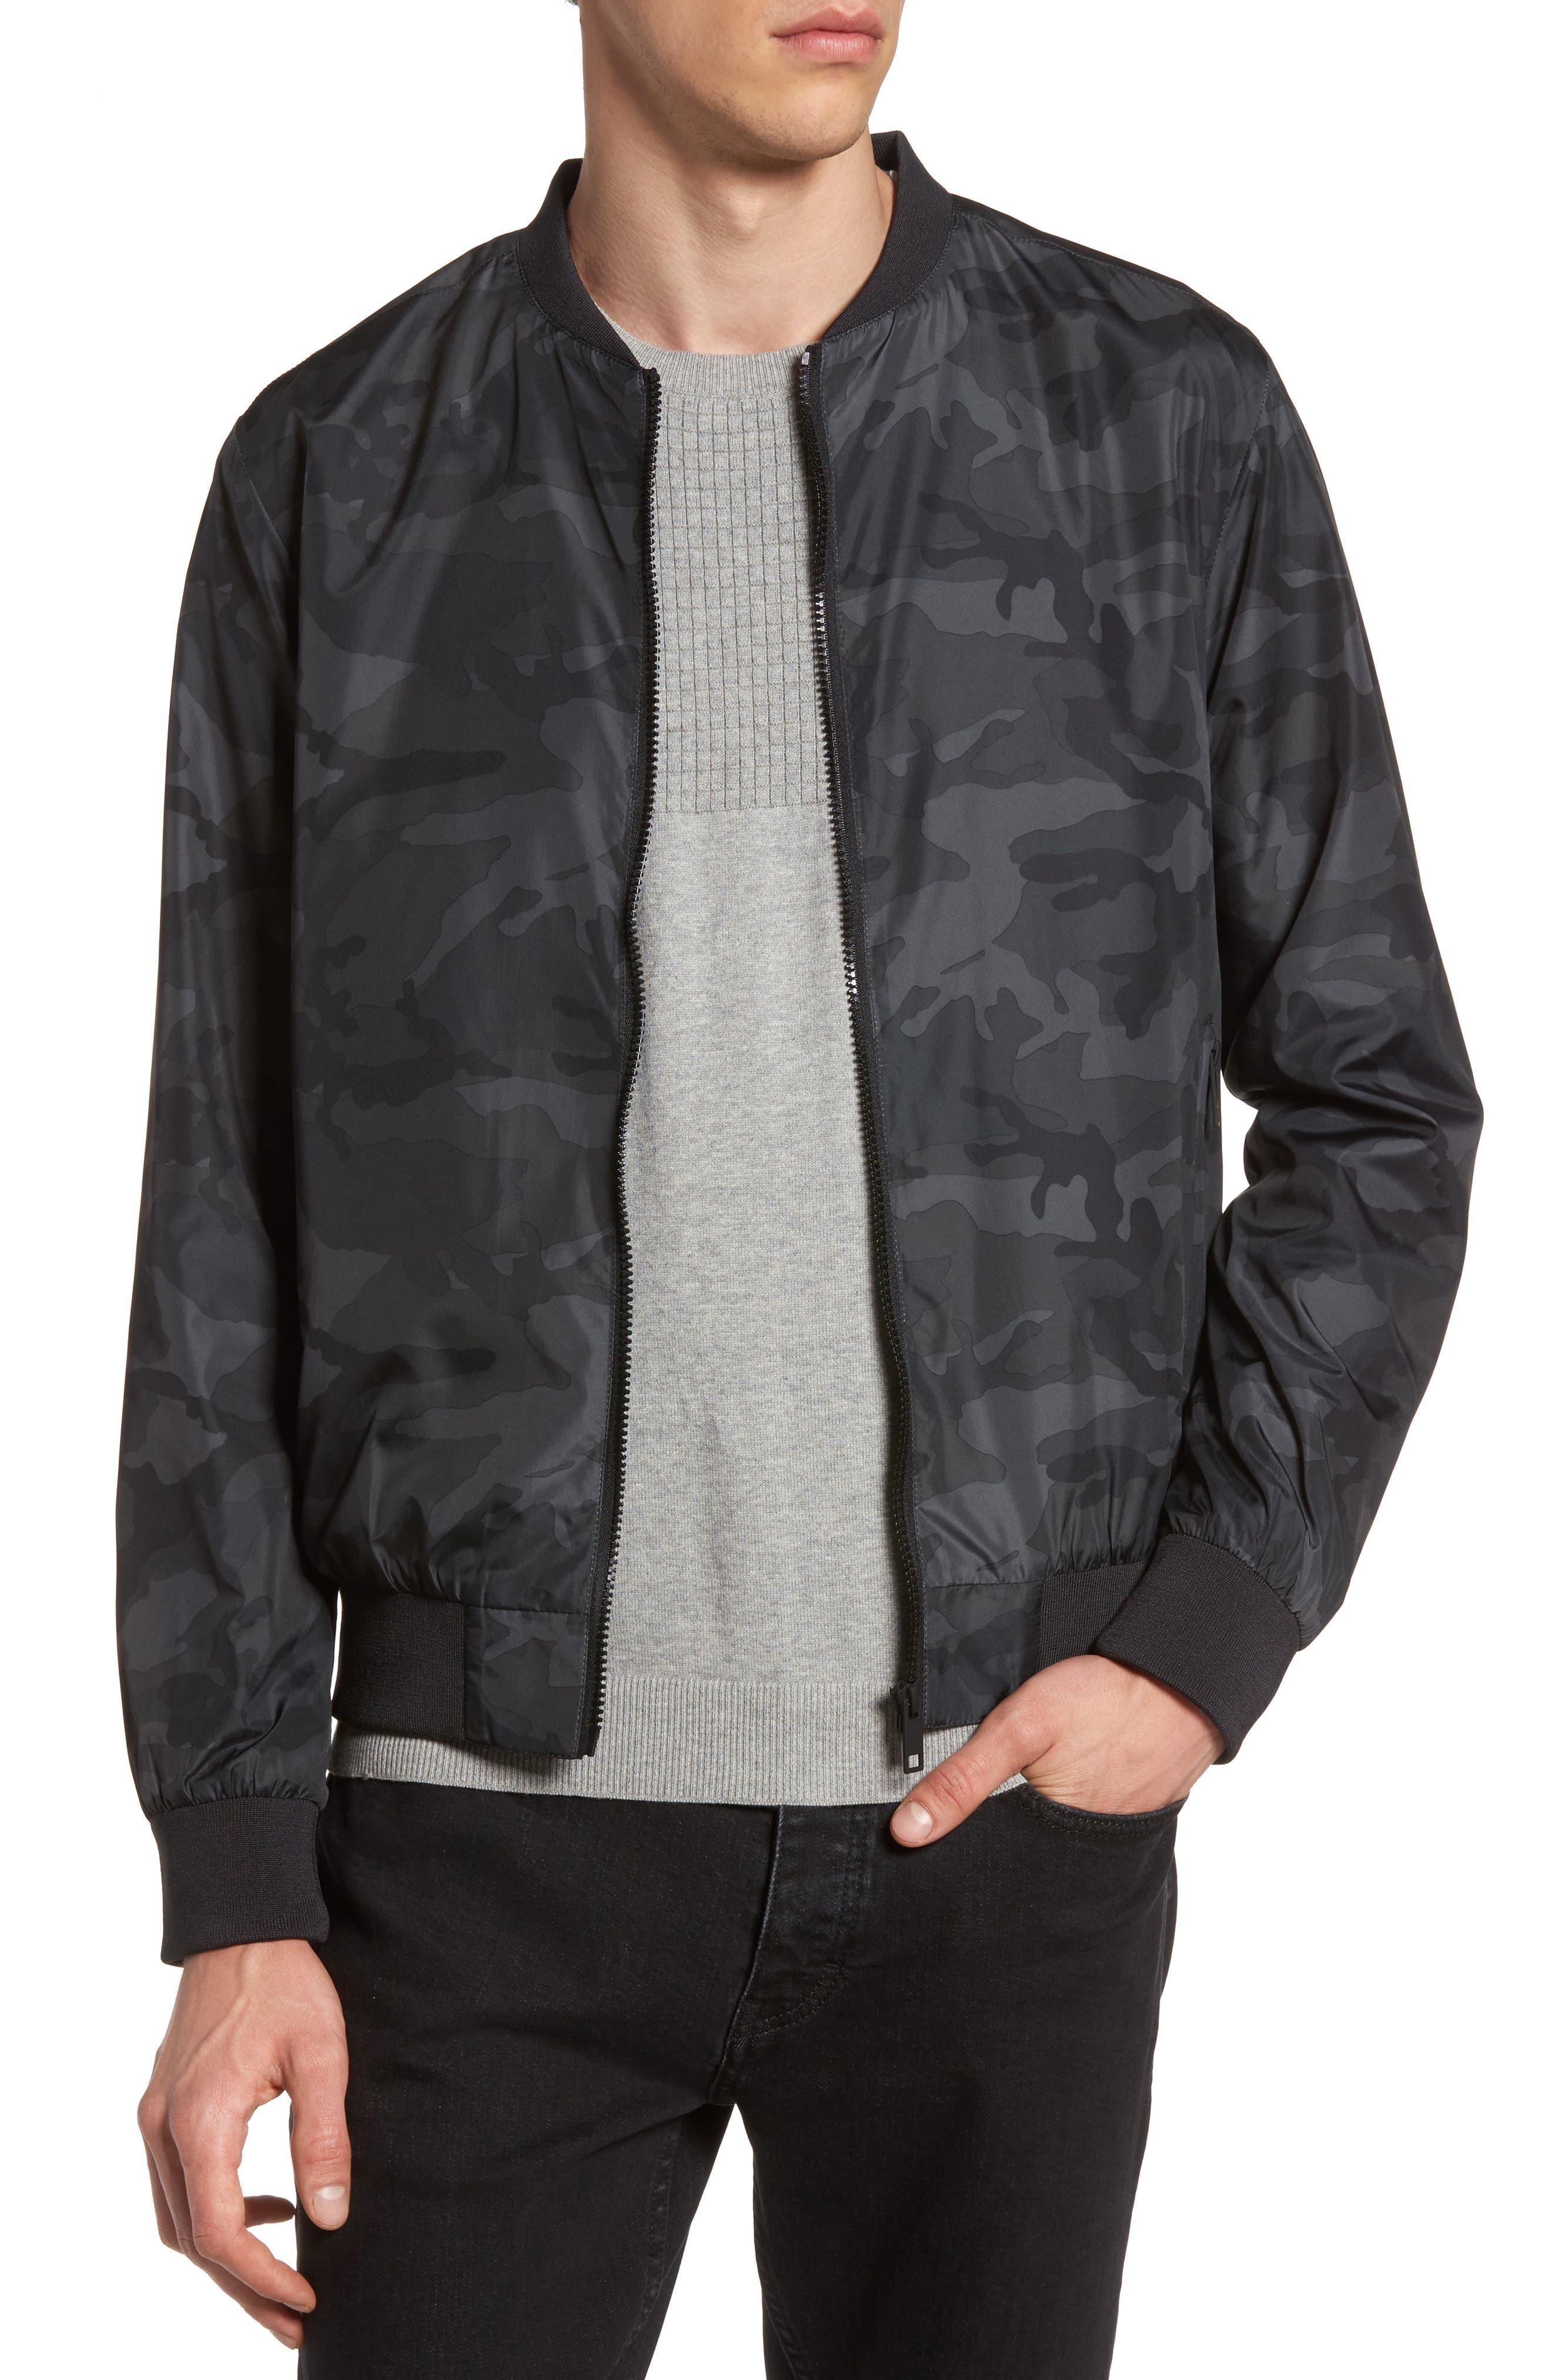 Camo Print Bomber Jacket,                             Main thumbnail 1, color,                             Grey Multi